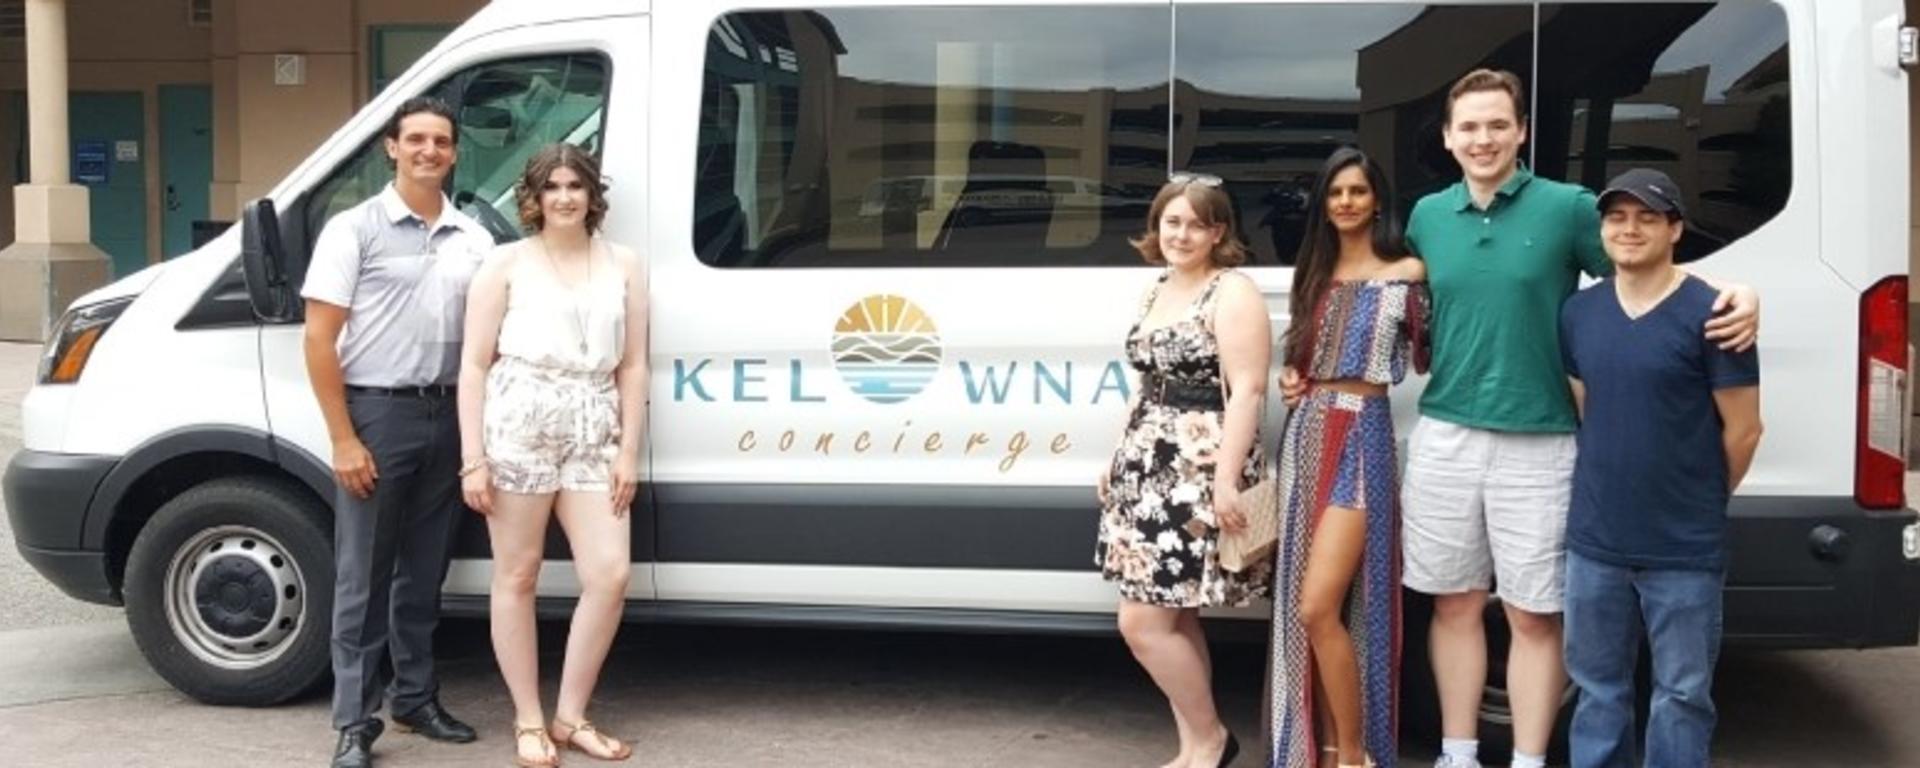 Kelowna Concierge Image 1